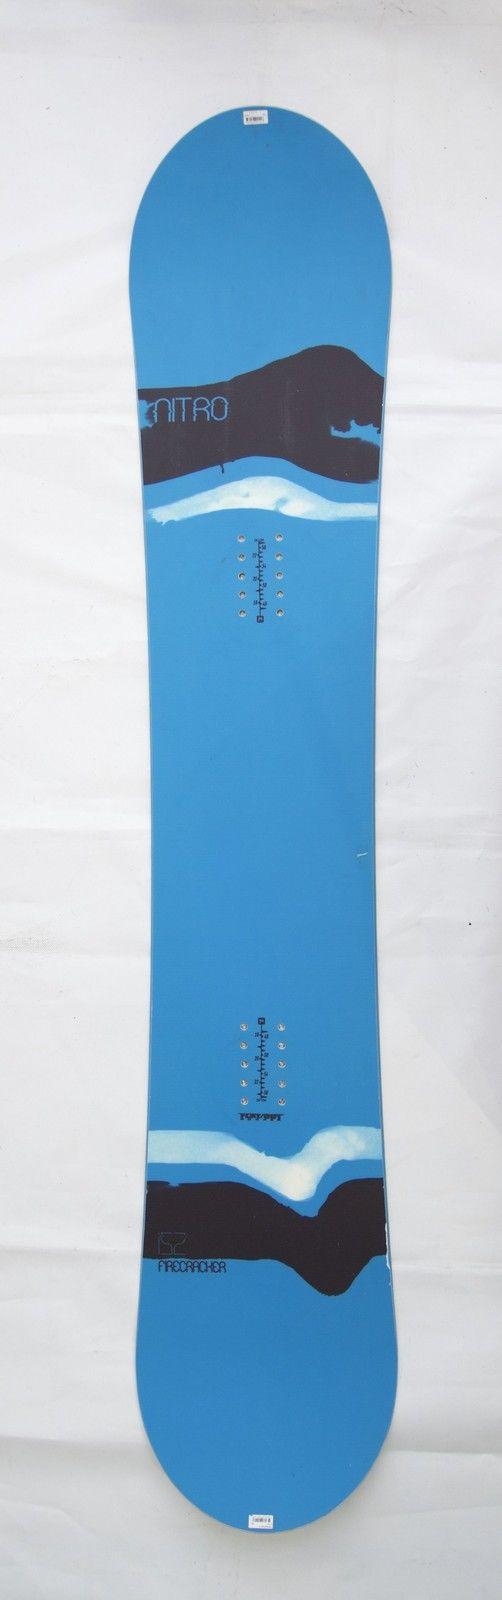 Firekracker 152 cm Snowboard Damen Nitro 2016 gebraucht